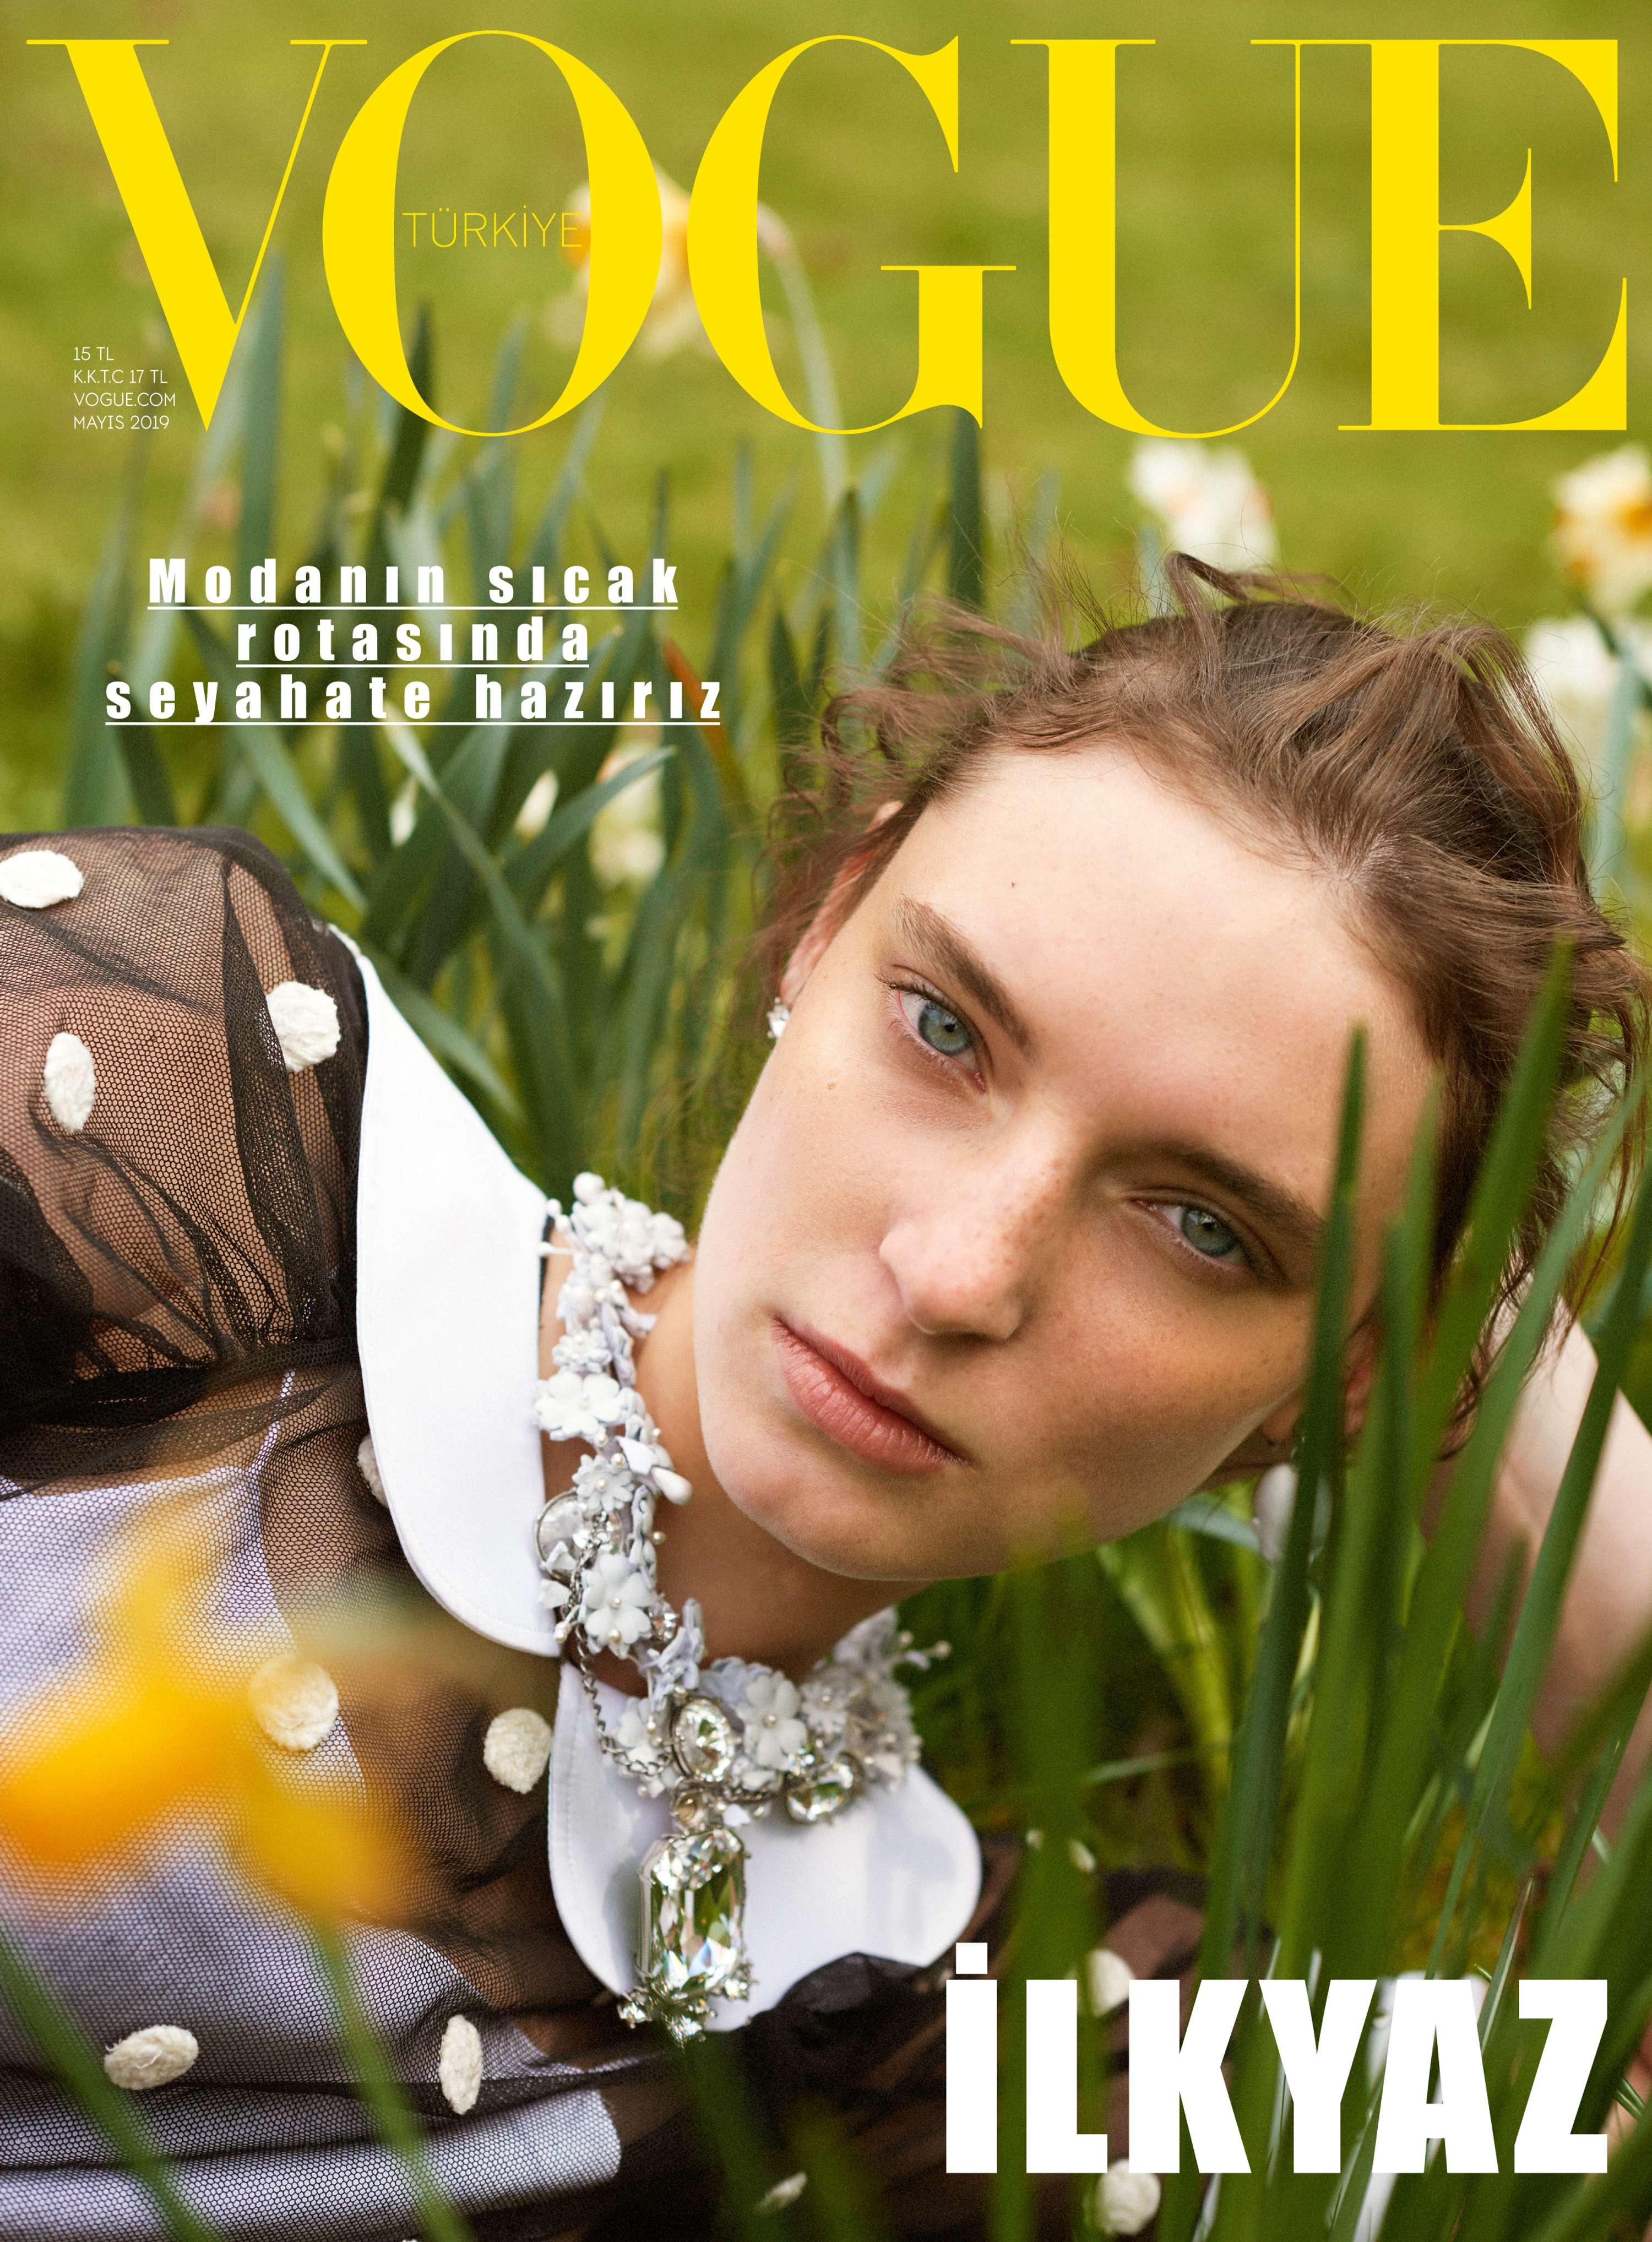 Vogue Turkiye Spring 5 Cover Story by Wai Lin Tse  The Dots